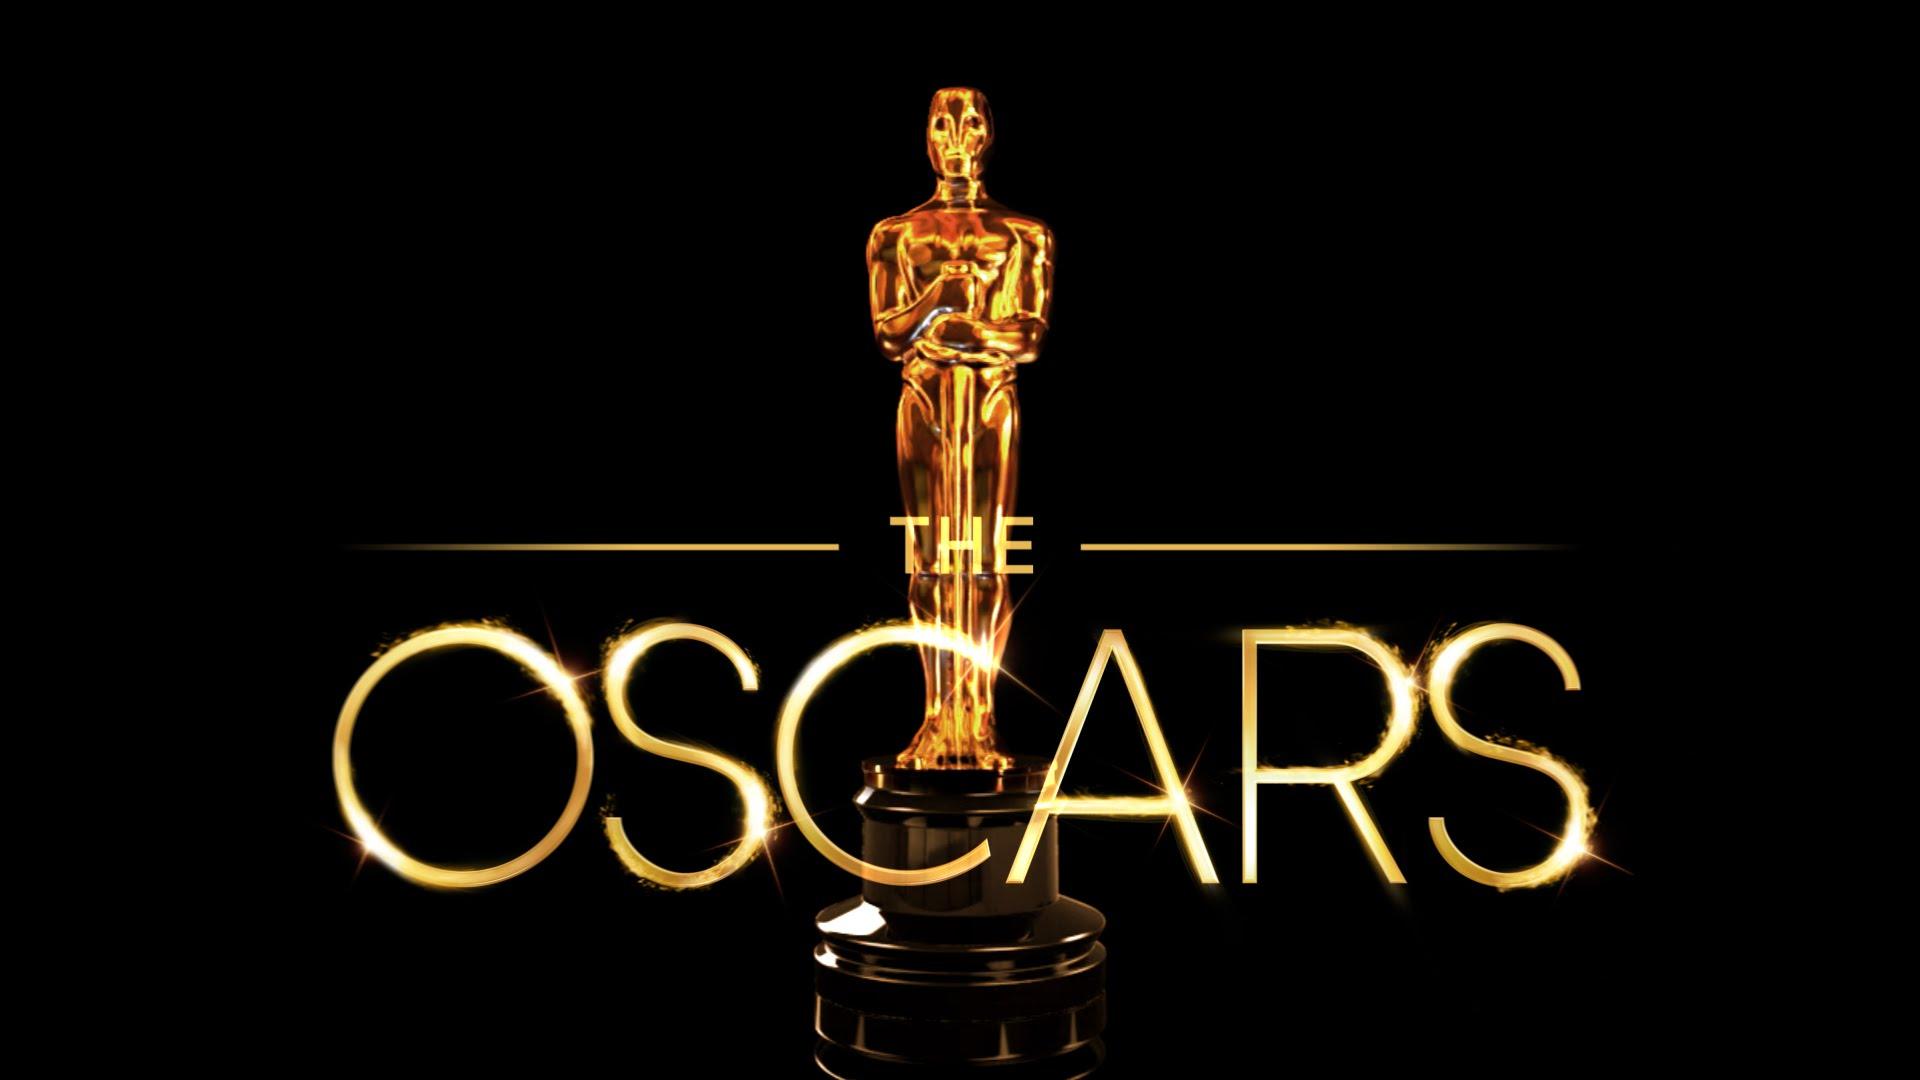 2020 OSCARS Foreign Language Film Award renamed International 1920x1080